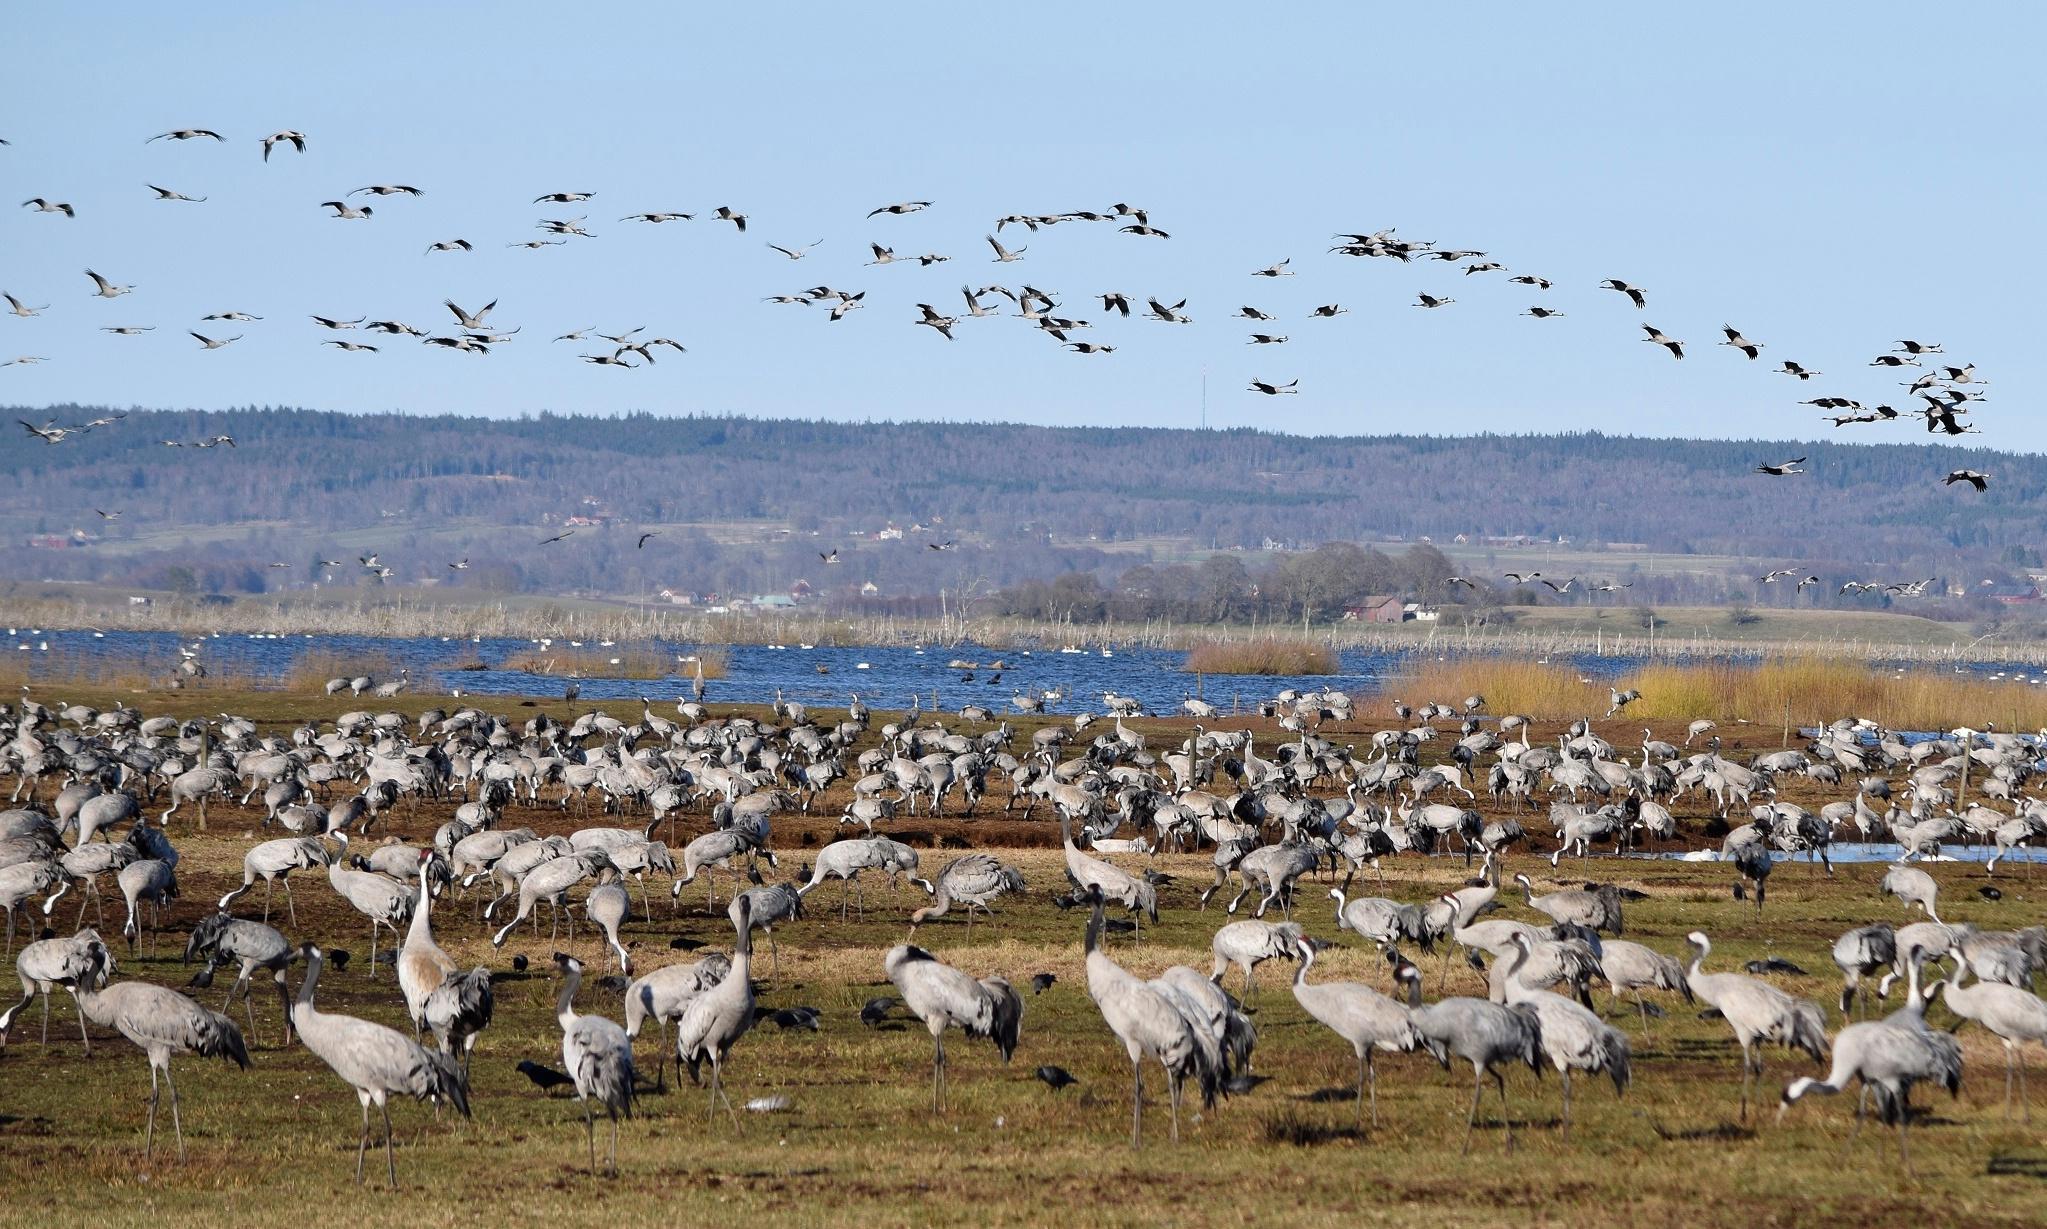 The dancing cranes of West Sweden – a bucket list wildlife spectacle